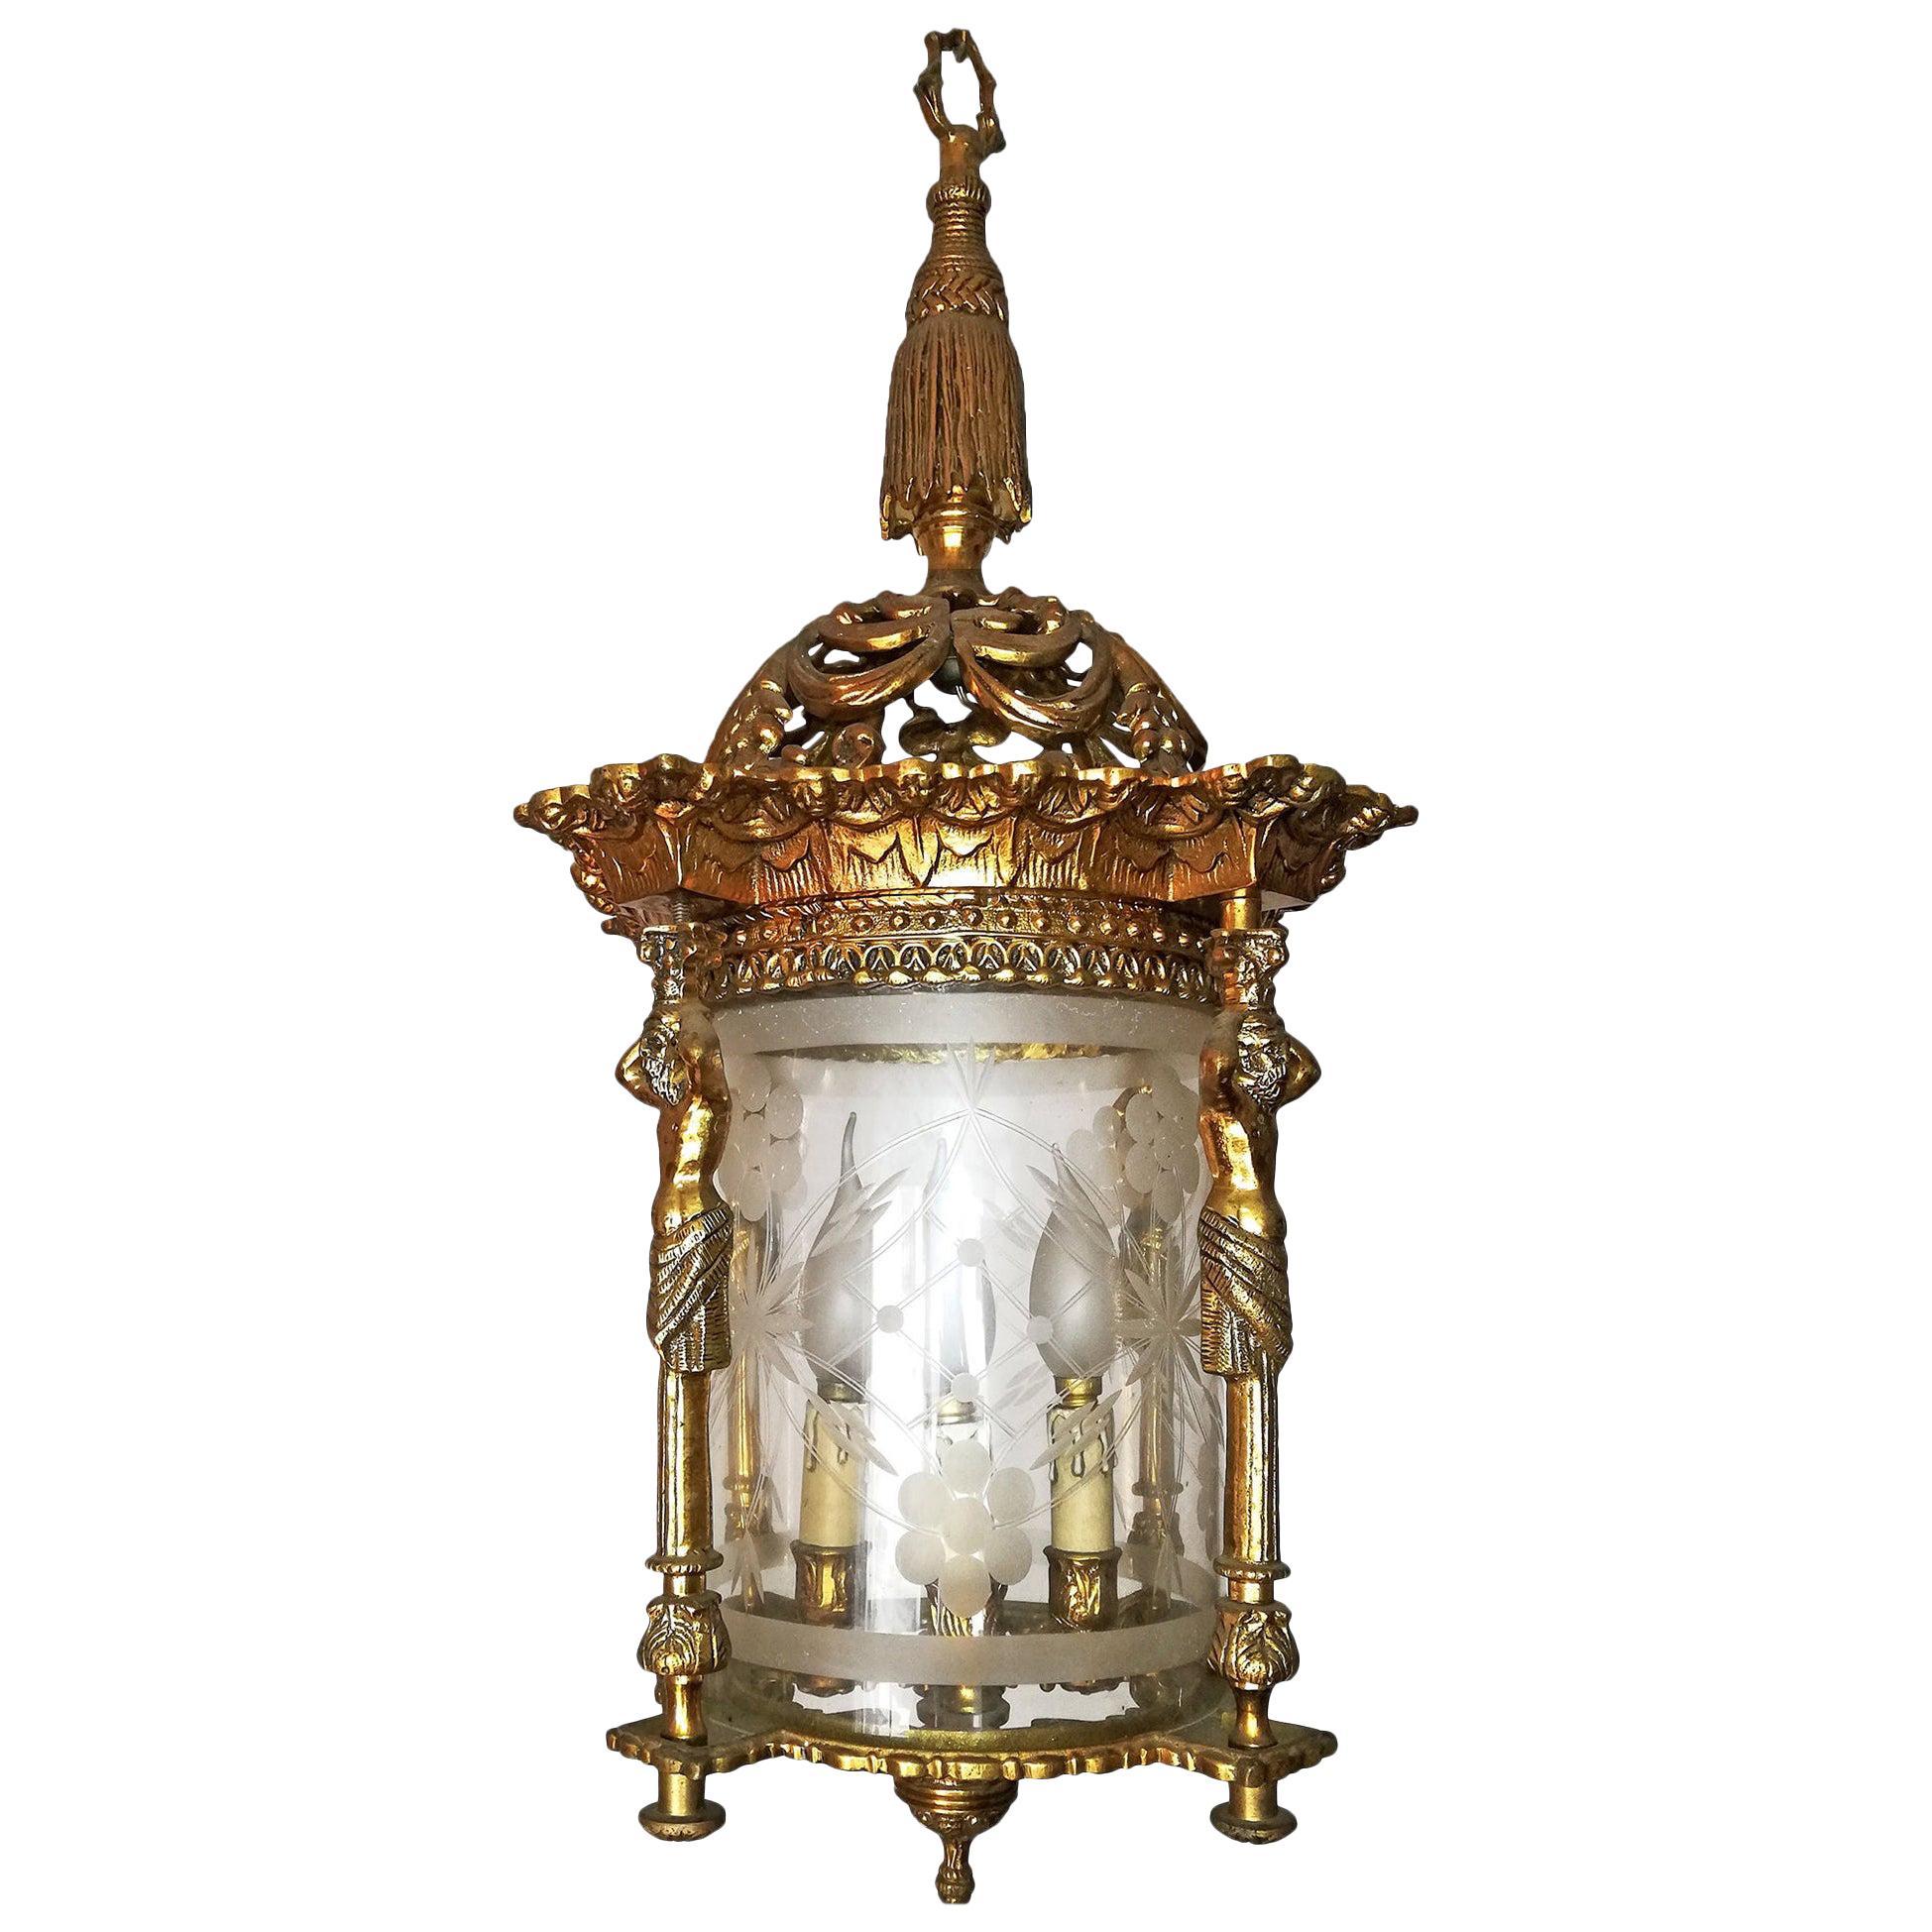 French Empire Caryatids Fire Gilded Bronze Cut Glass 4-Light Lantern Chandelier